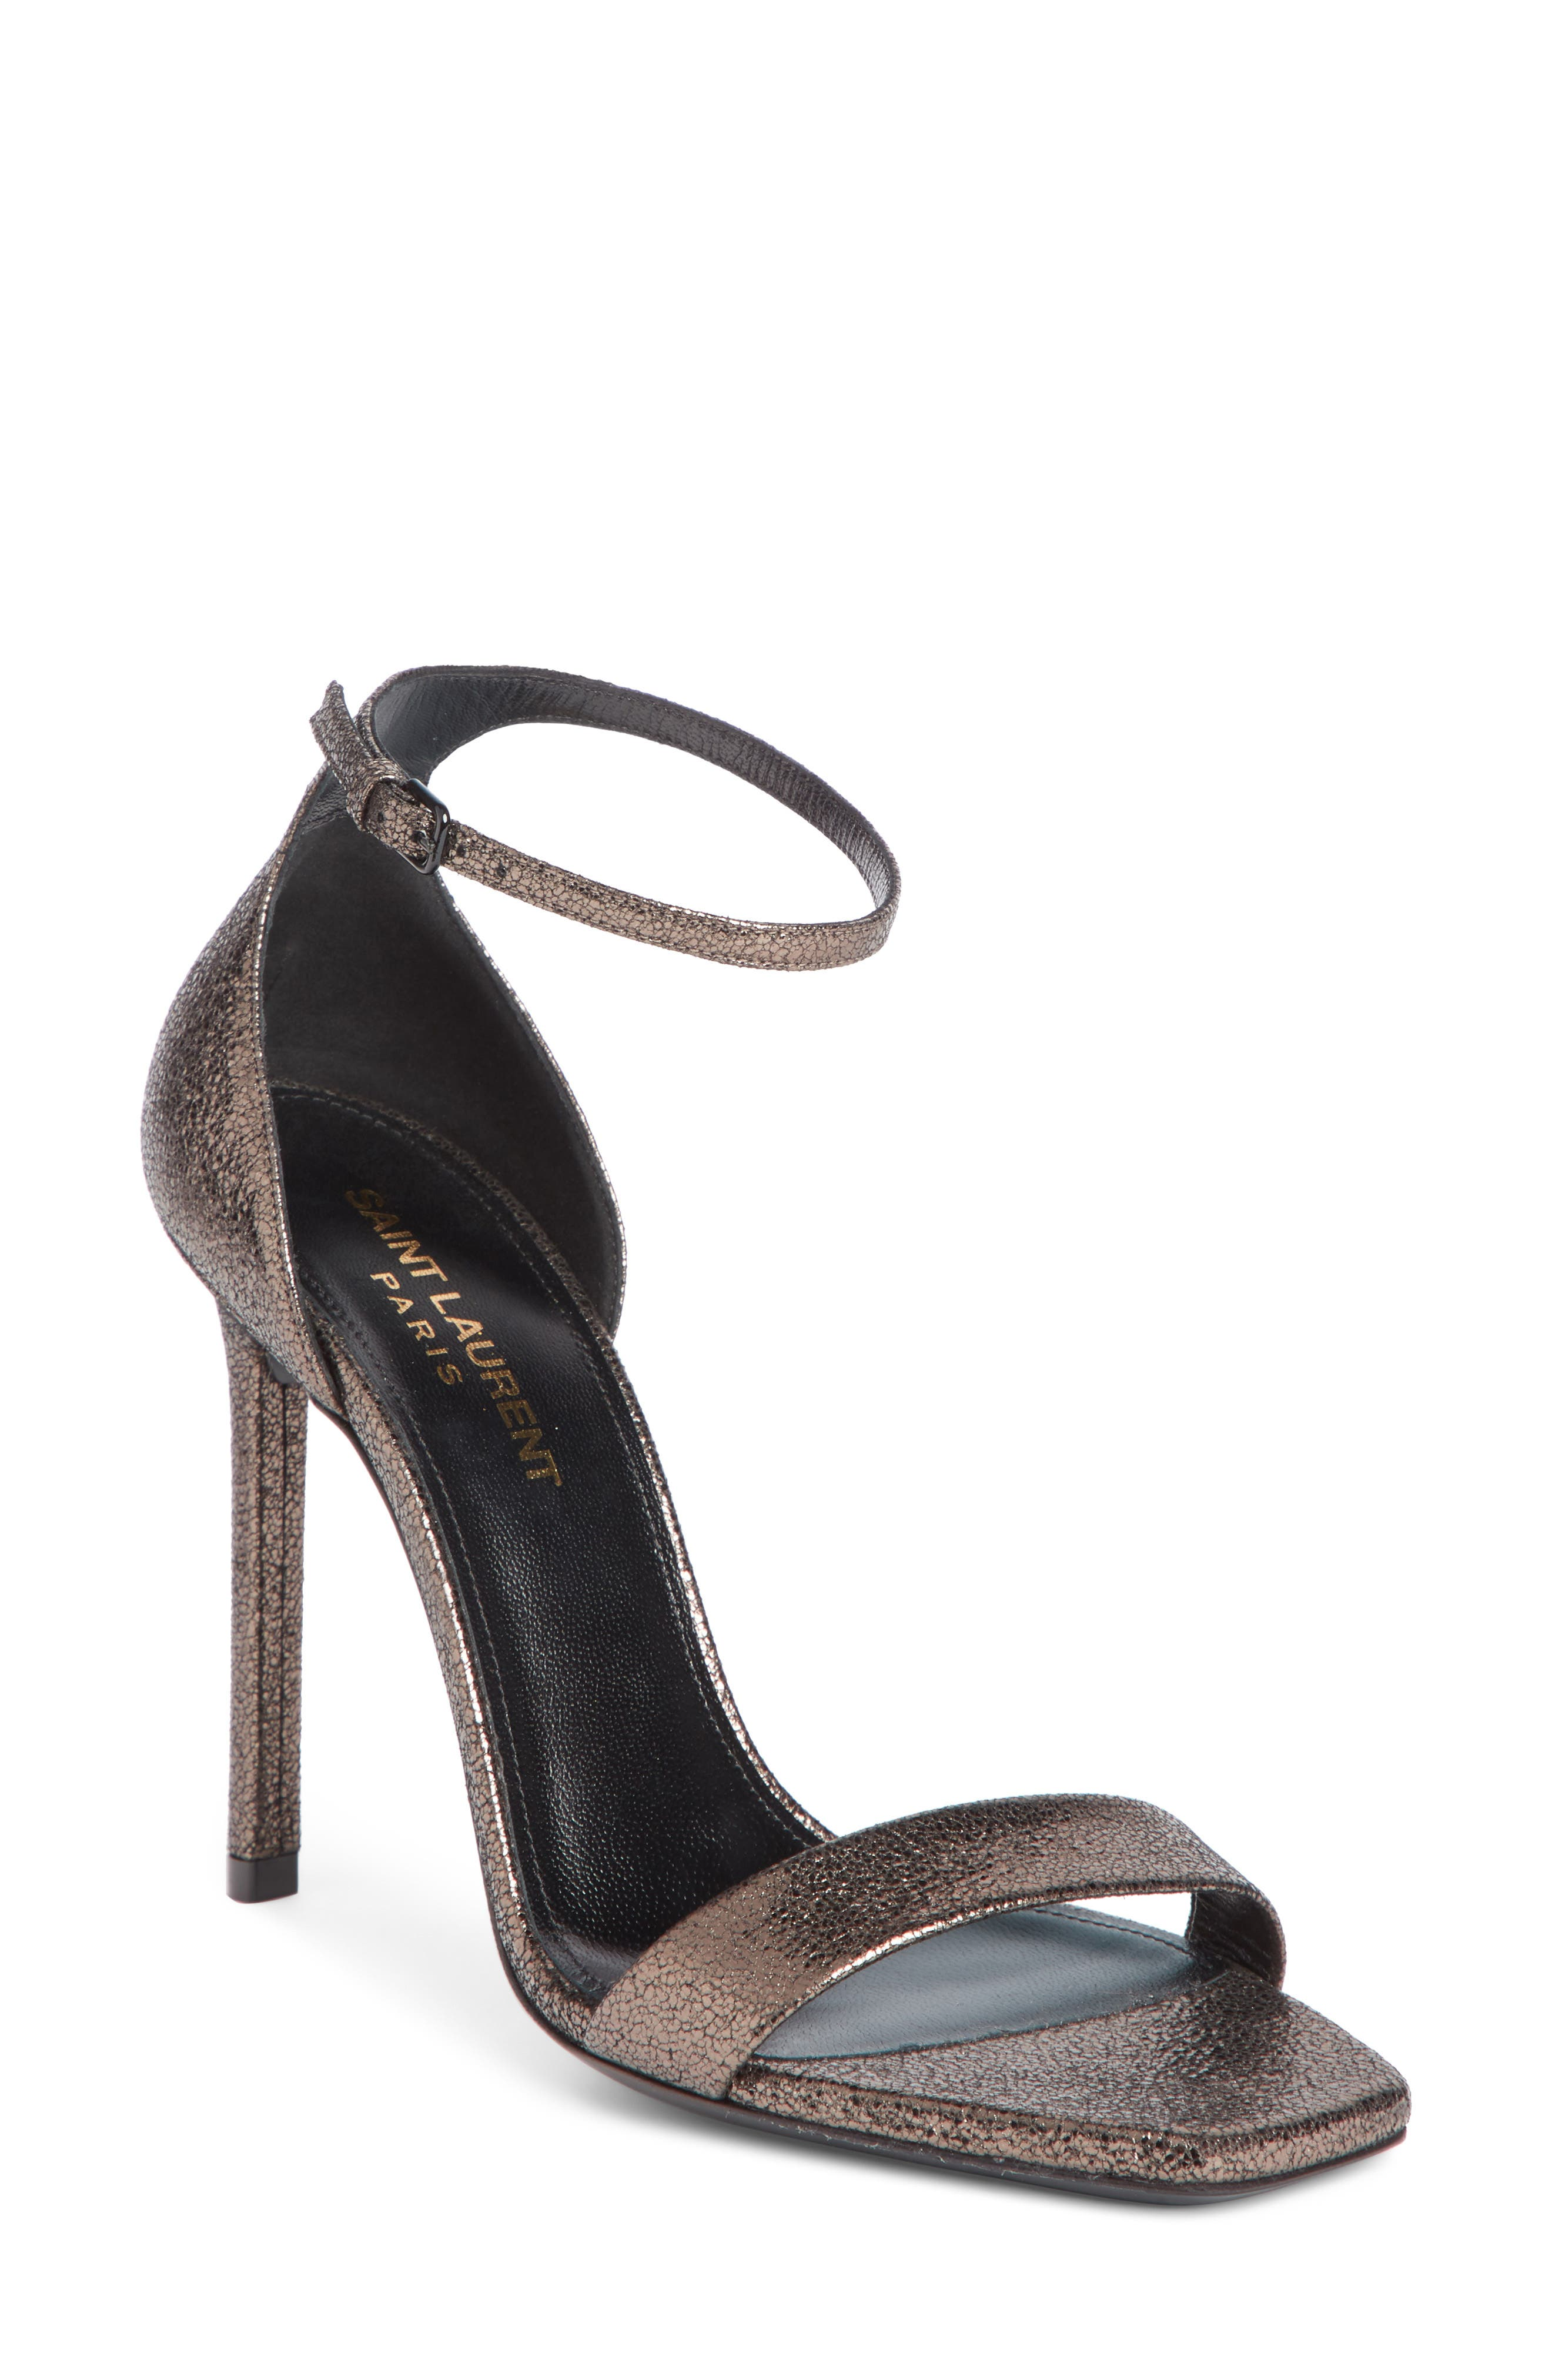 Amber Ankle Strap Sandal,                             Main thumbnail 1, color,                             BLACK/ METALLIC